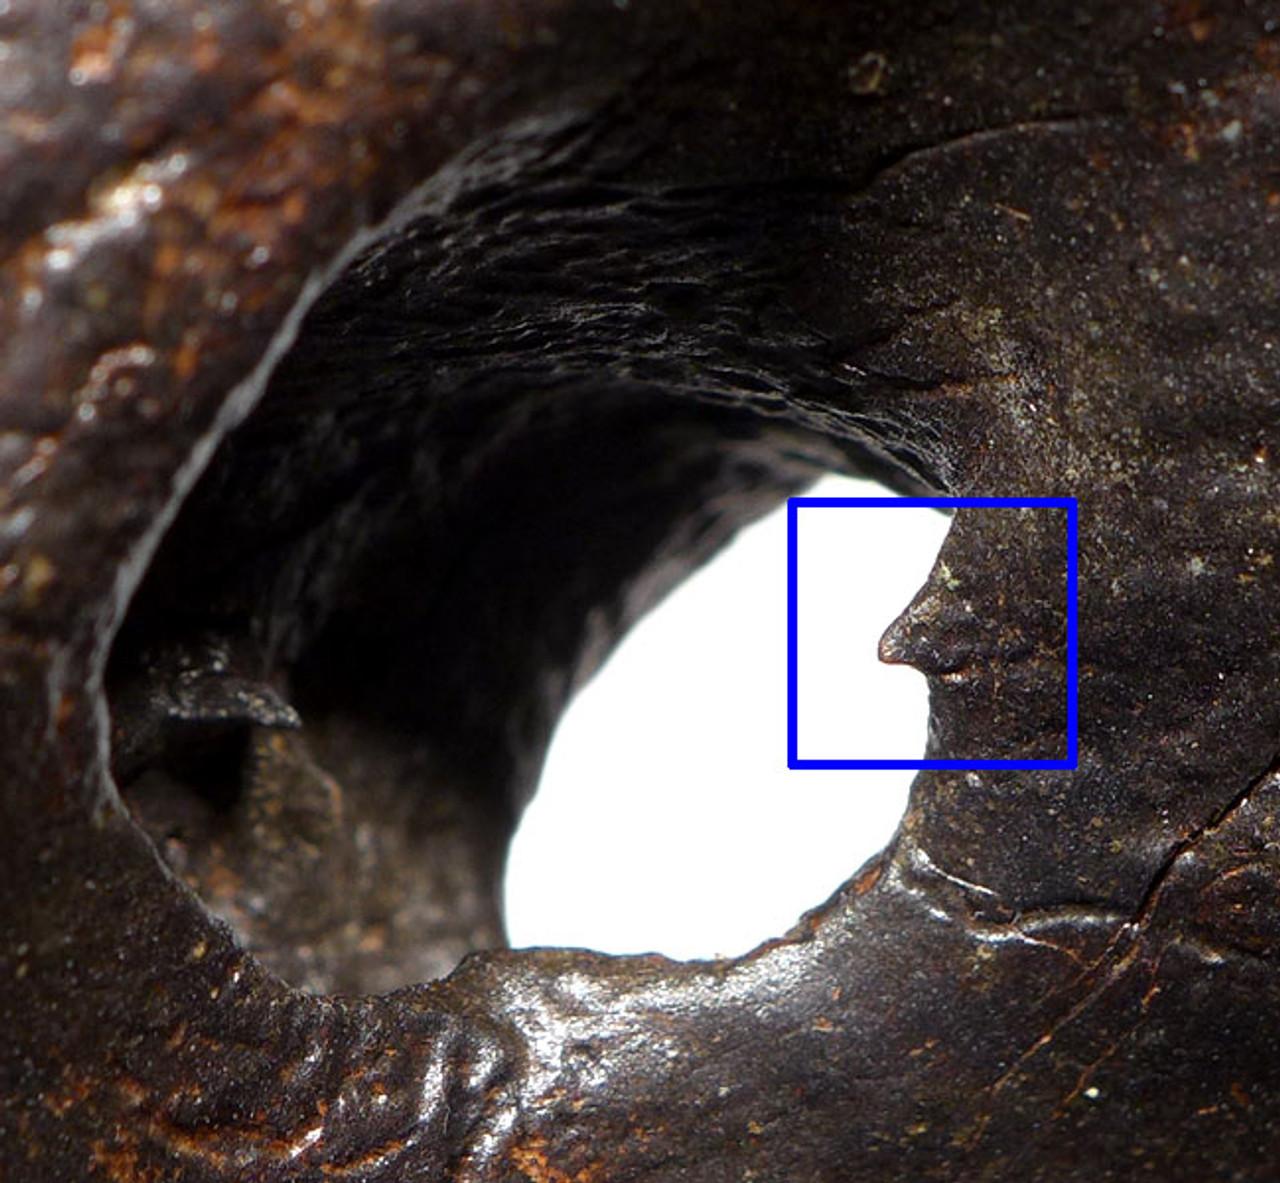 LMX168 - FOSSIL ATLAS VERTEBRA FROM A EUROPEAN ICE AGE STEPPE WISENT BISON